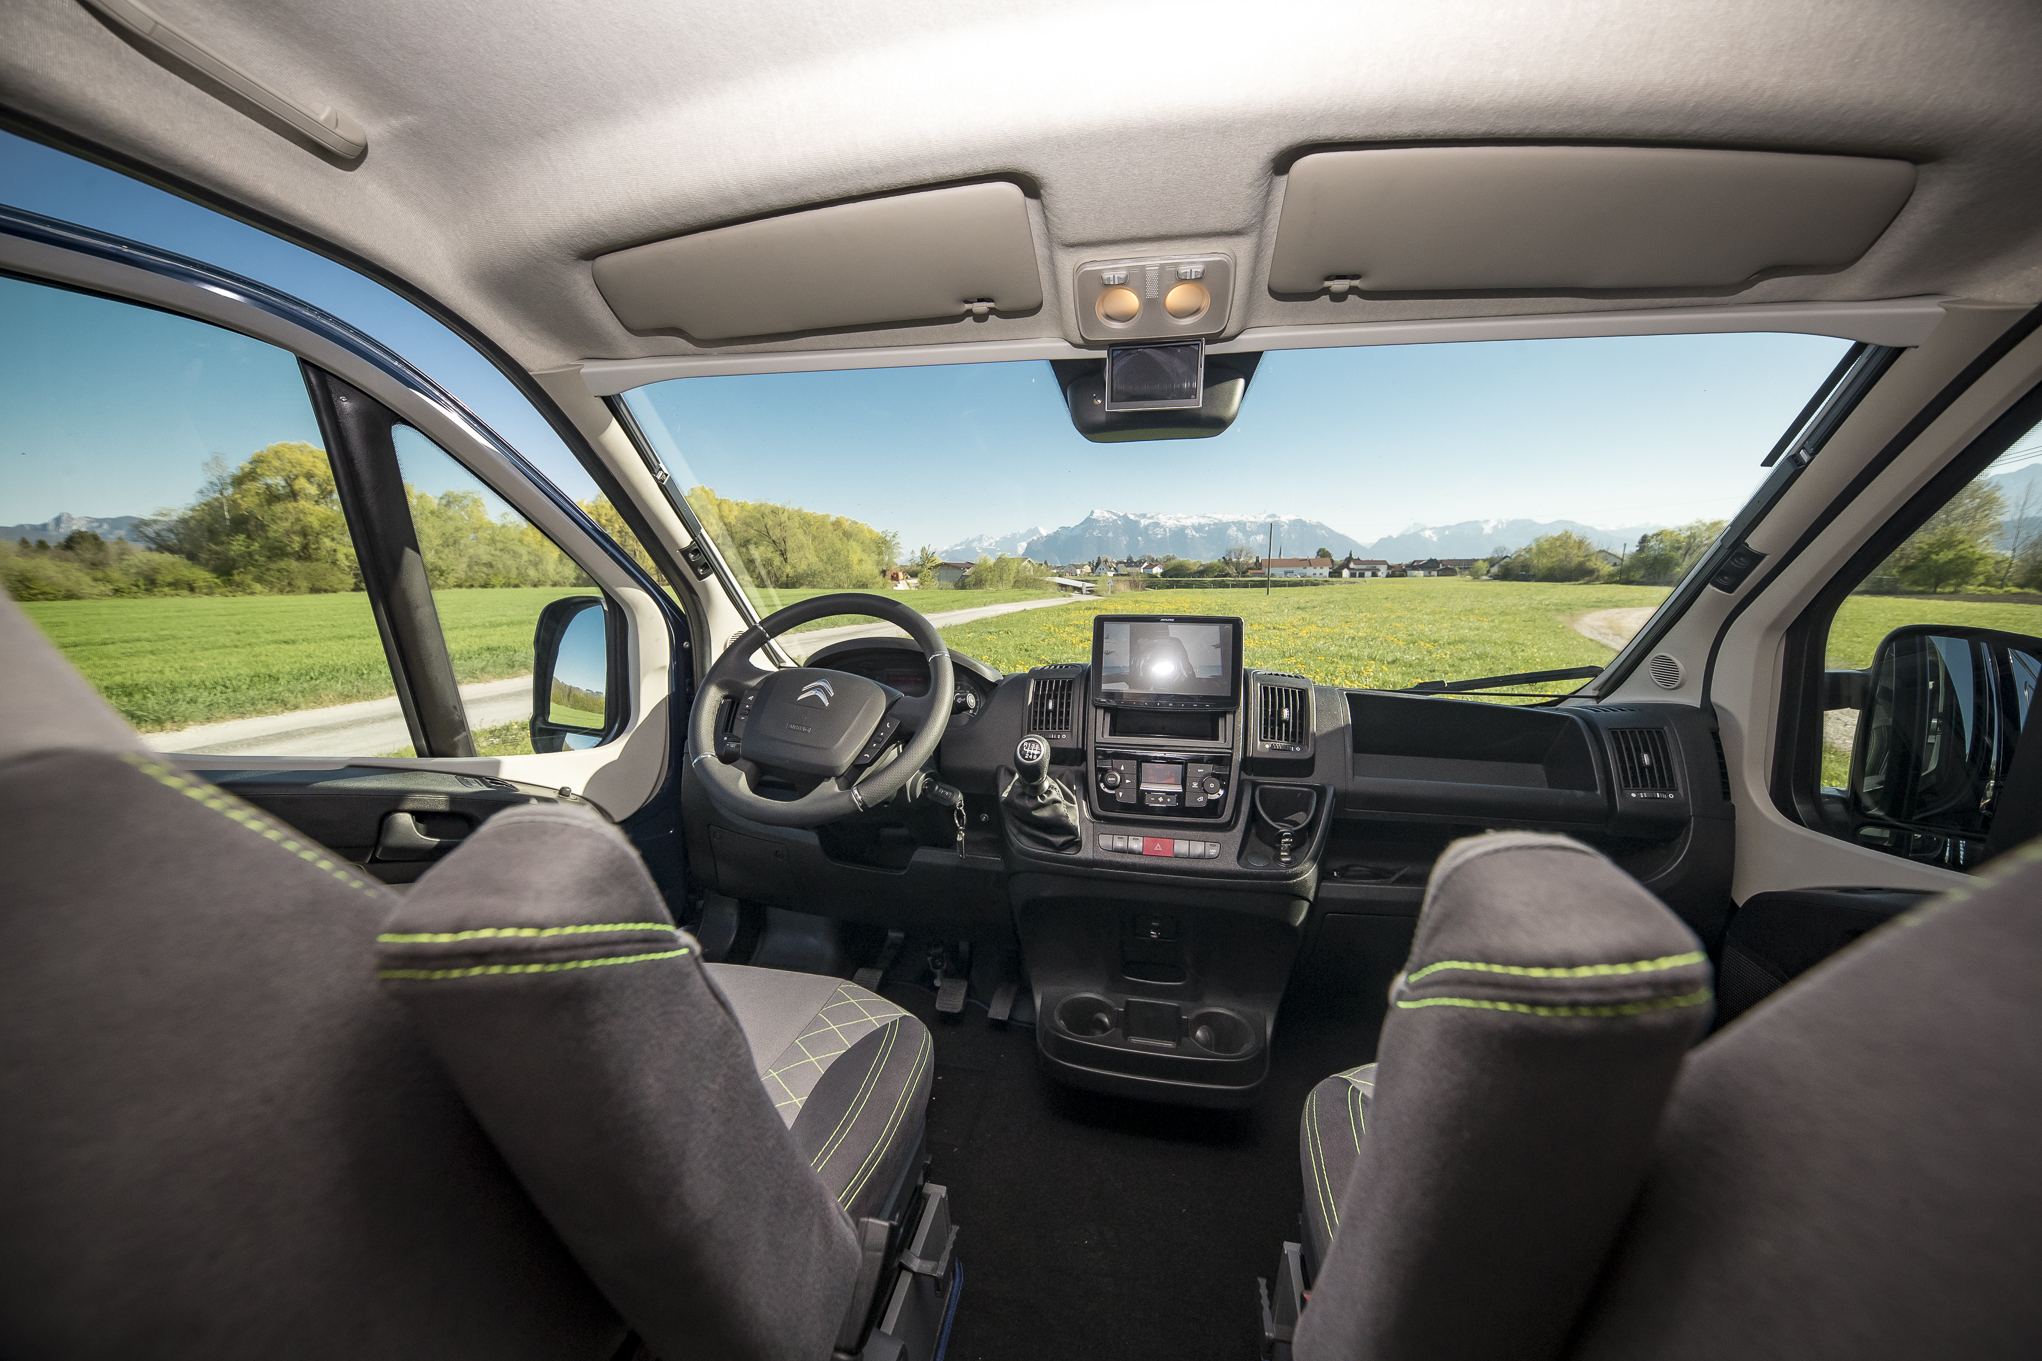 VR-Luxus Camper Alpine 903 Musik sound citroen jumper fiat ducato VR seat camping camper vanlife